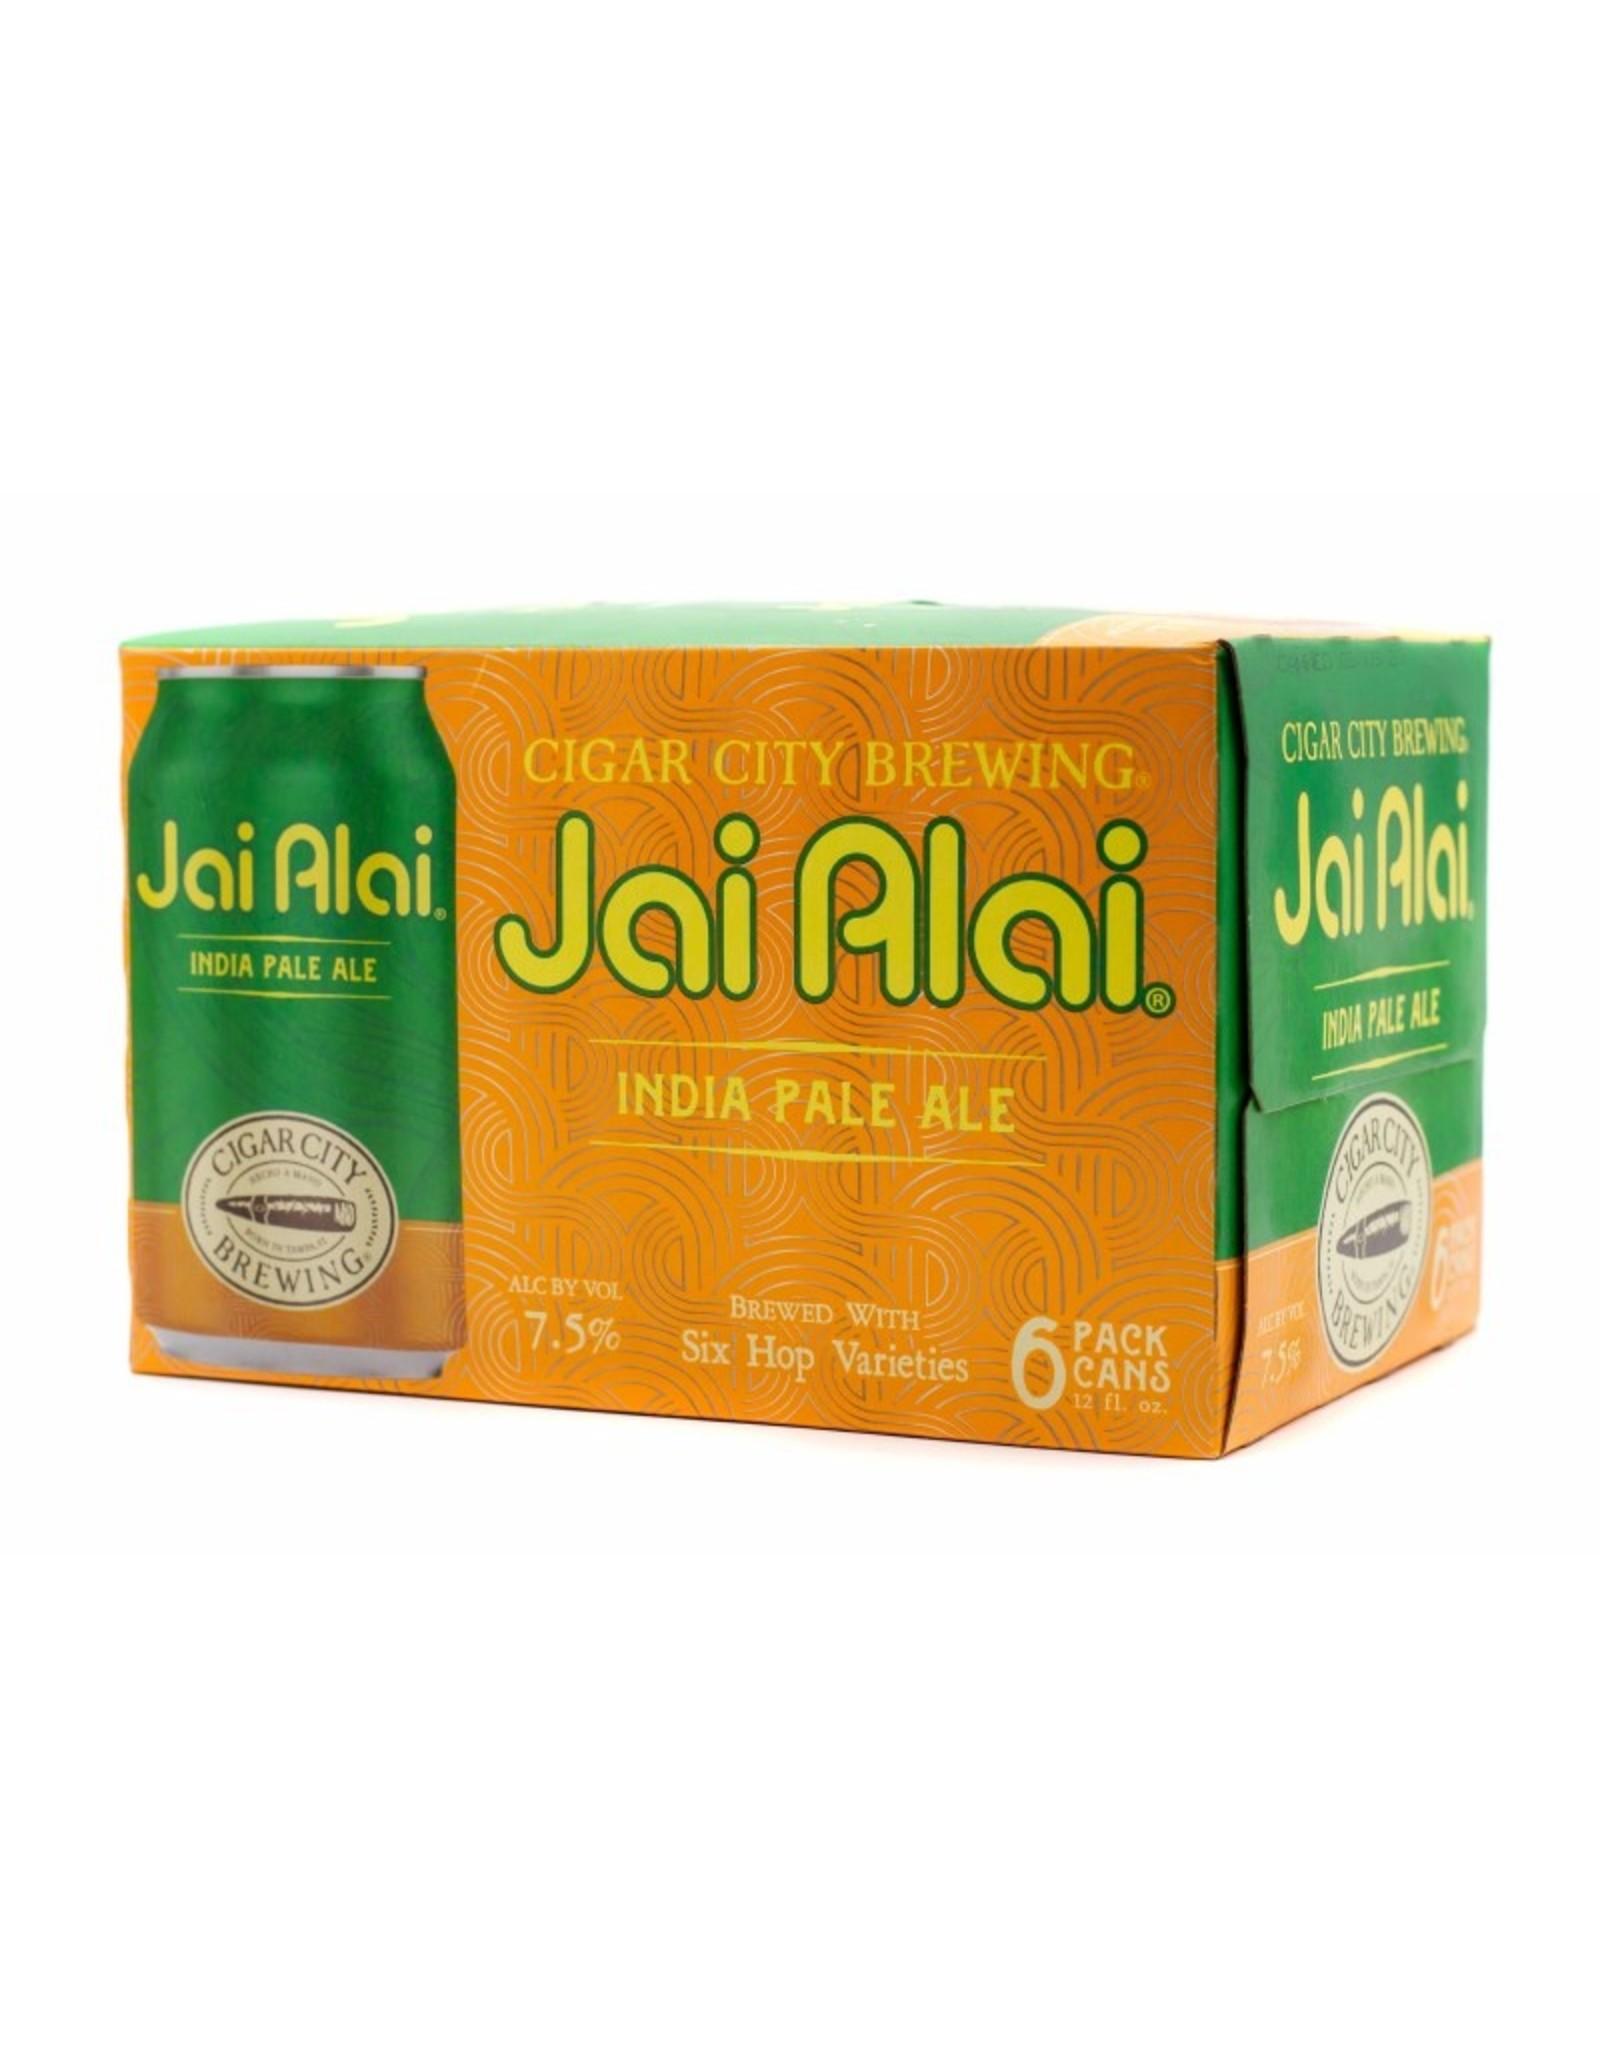 Cigar City Jai Alai IPA 6-Pack